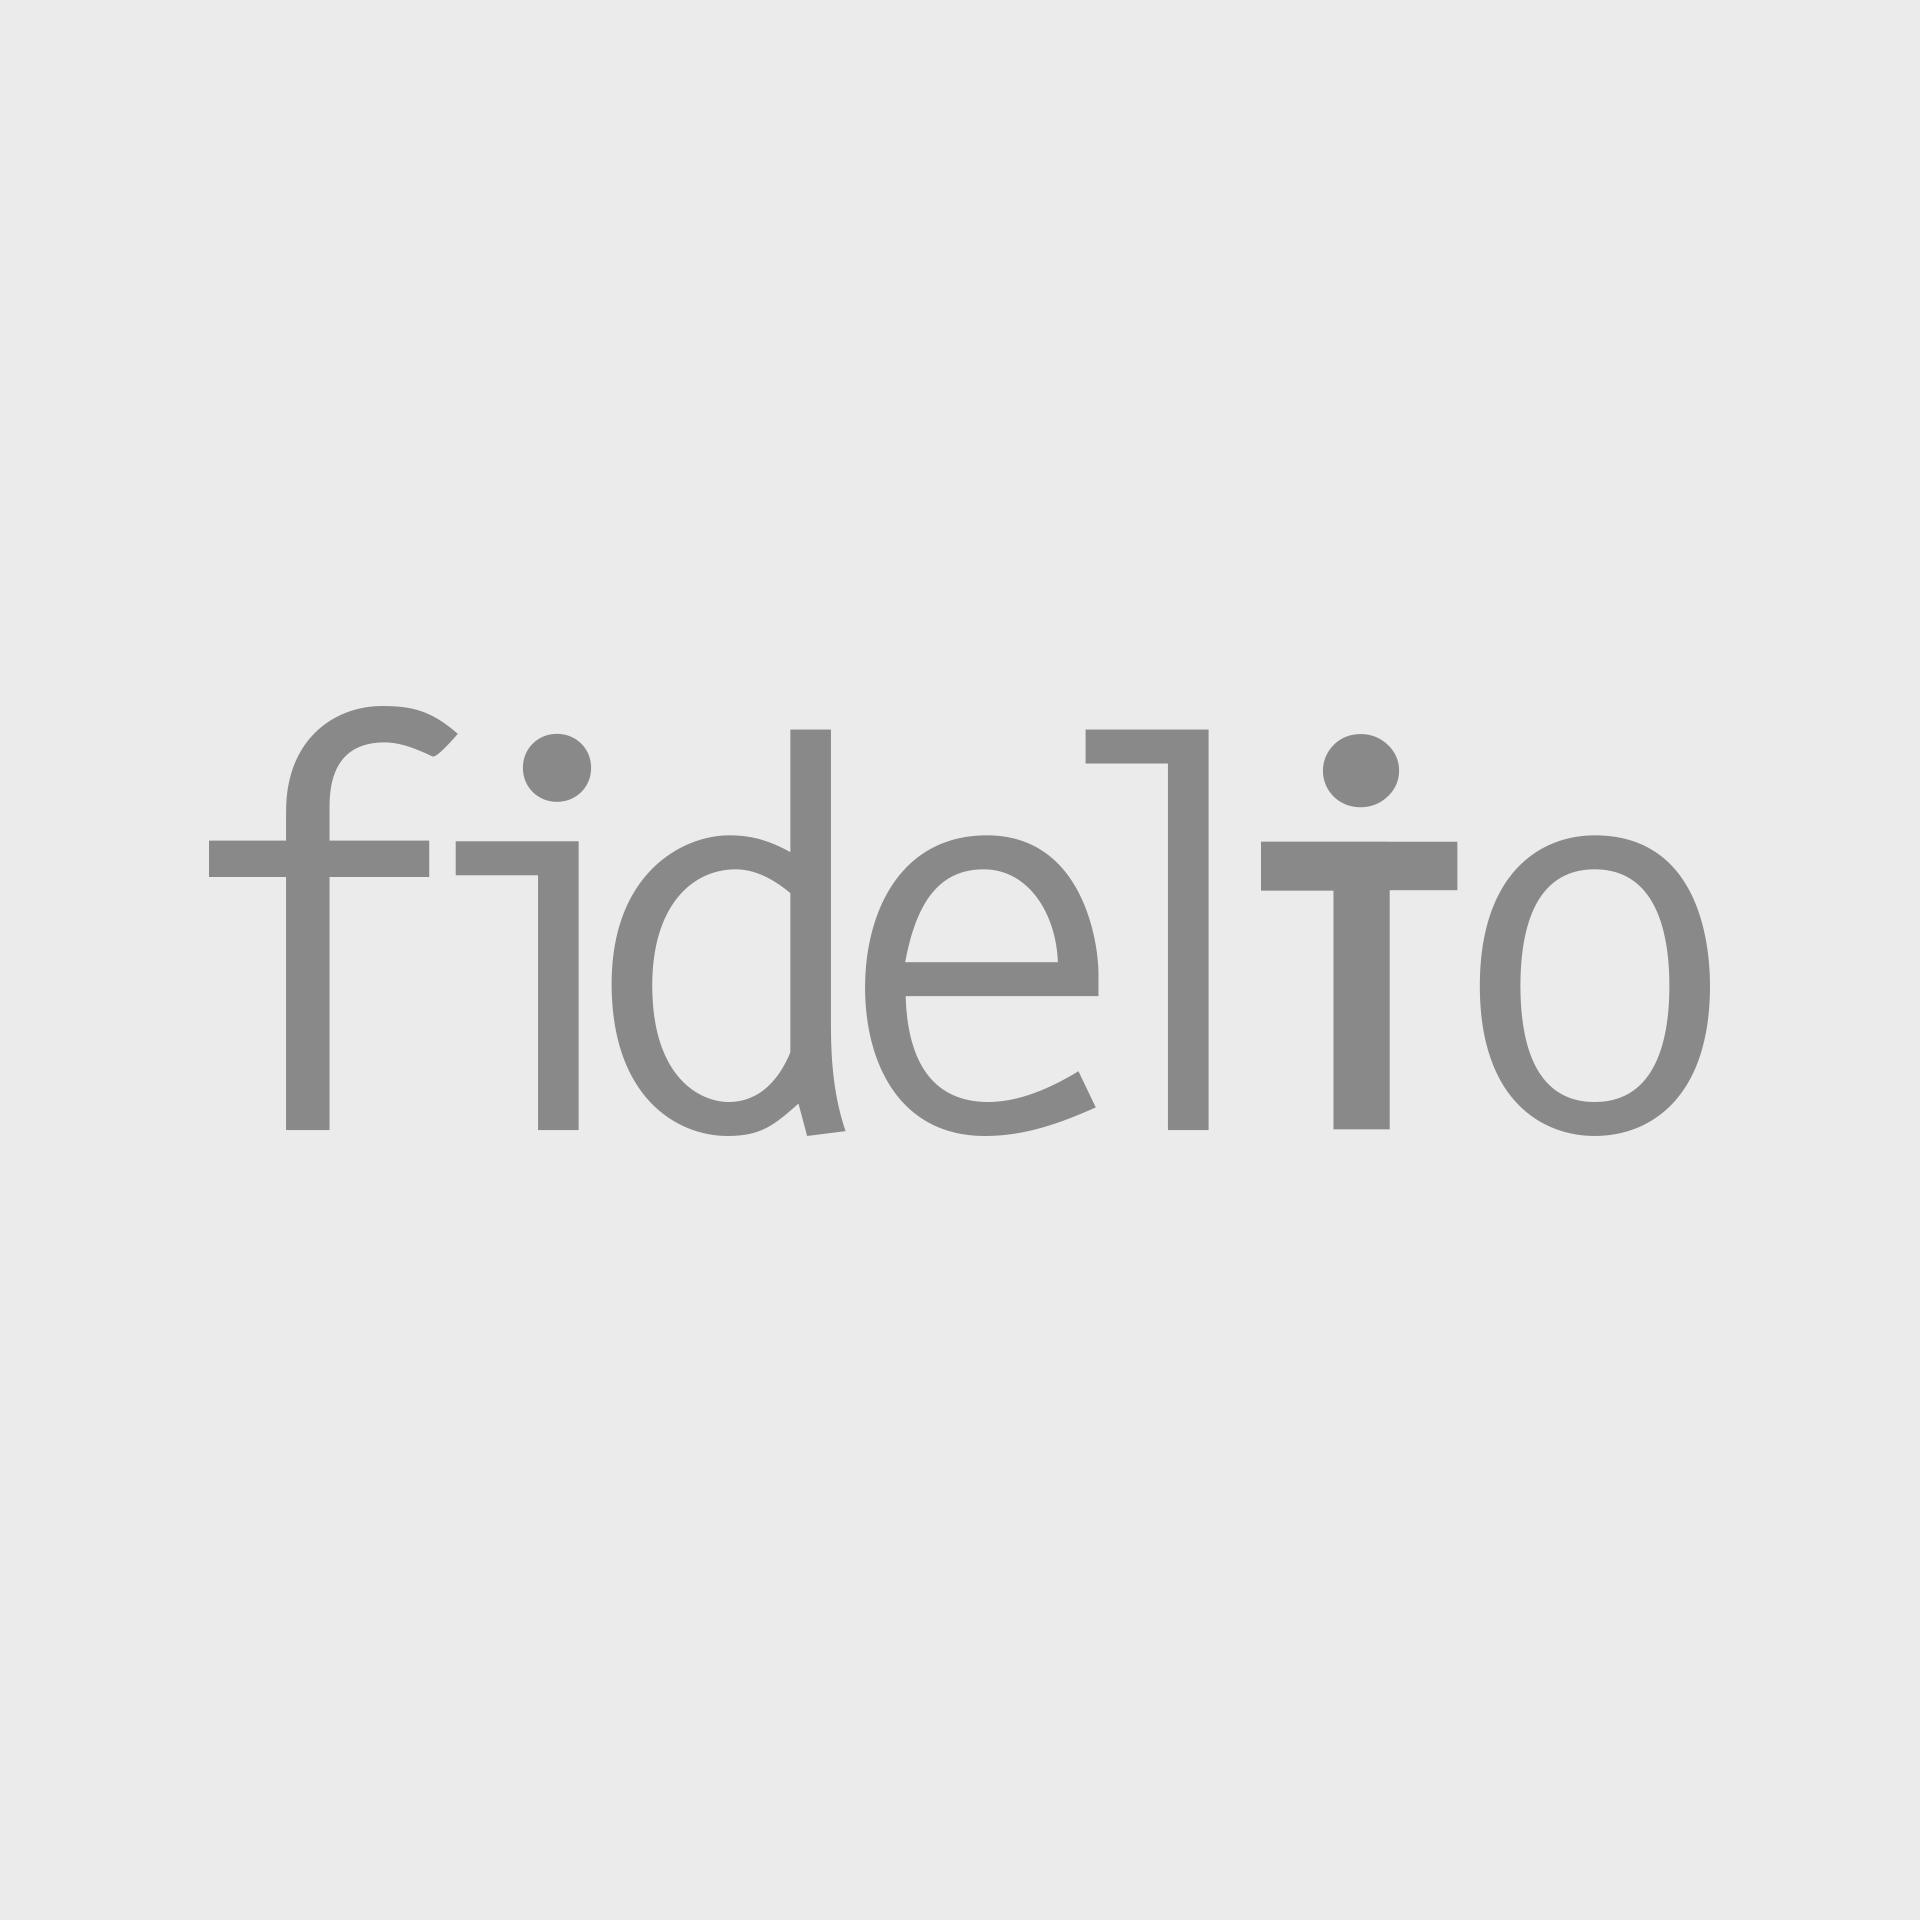 ECFDE12A-9BCC-40B3-A007-13C2A40A73D3